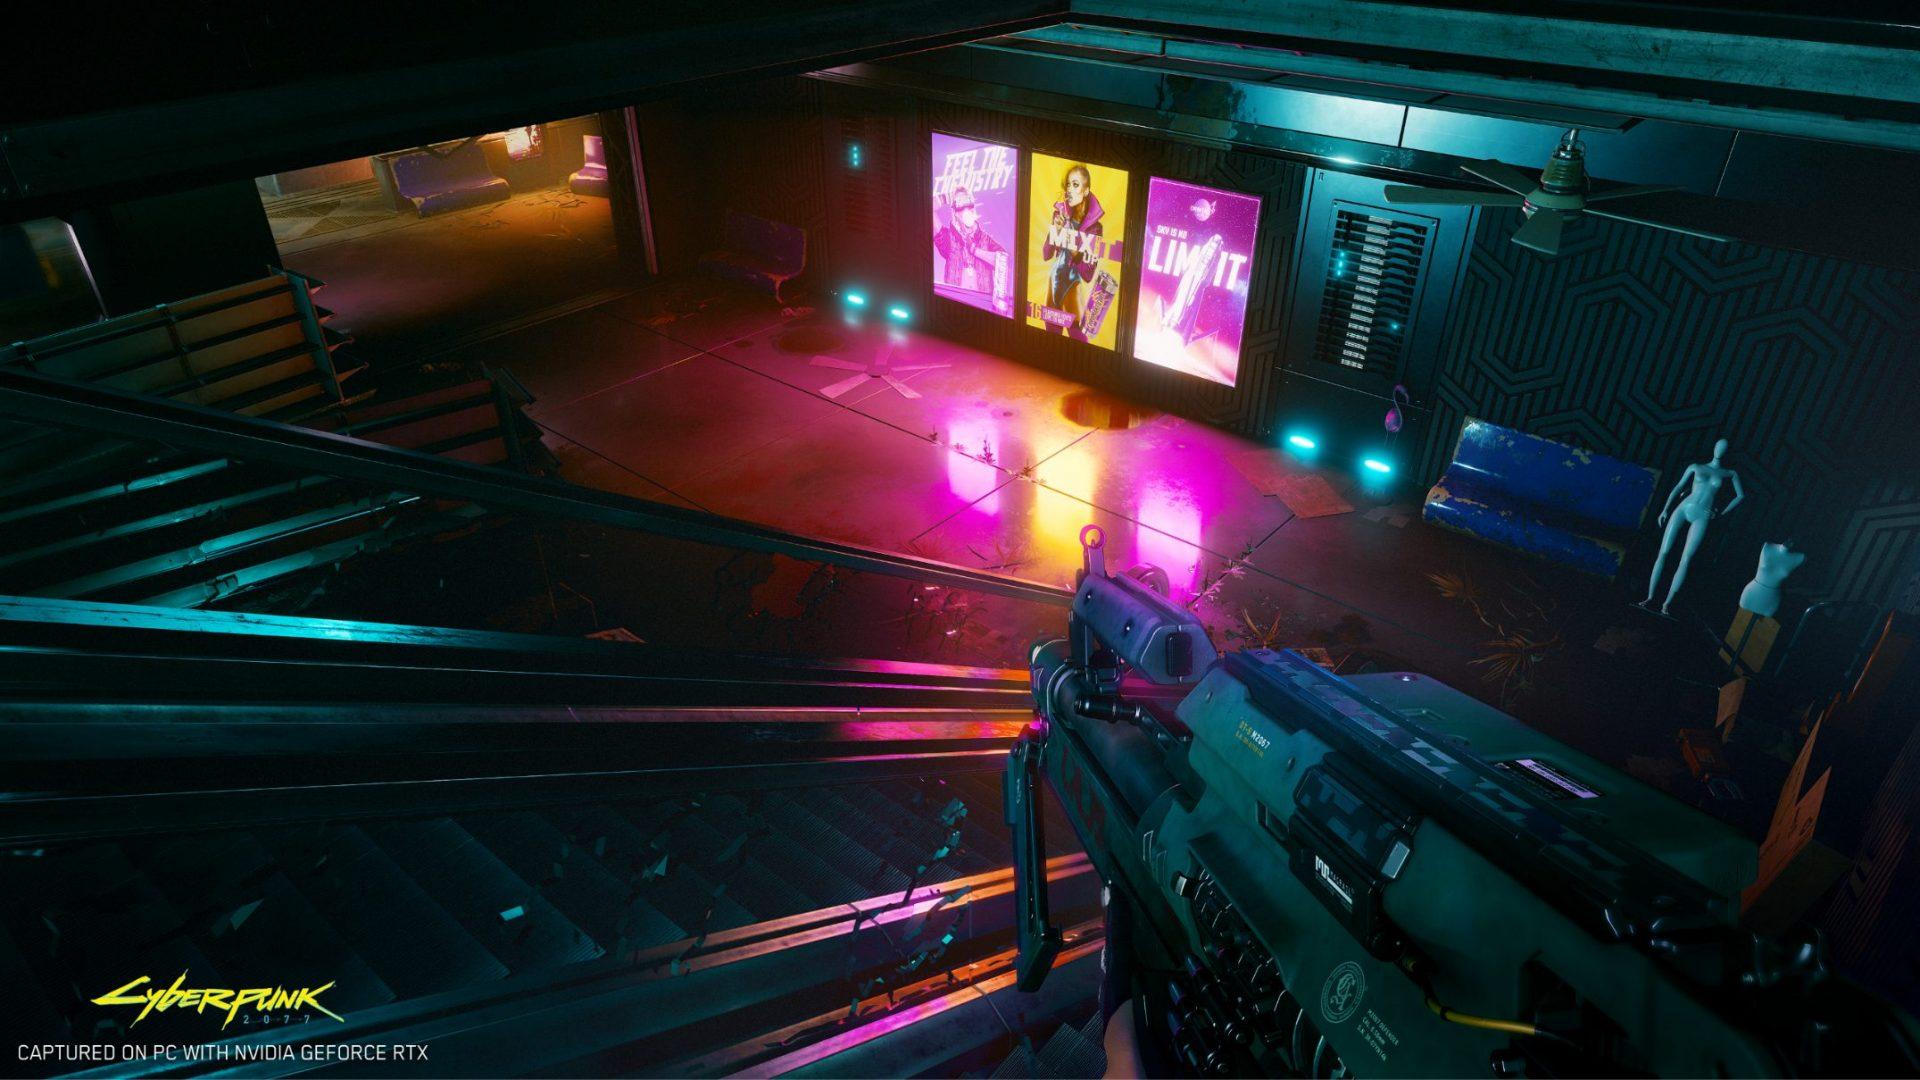 شخصیت-جدید-بازی-Cyberpunk-2077